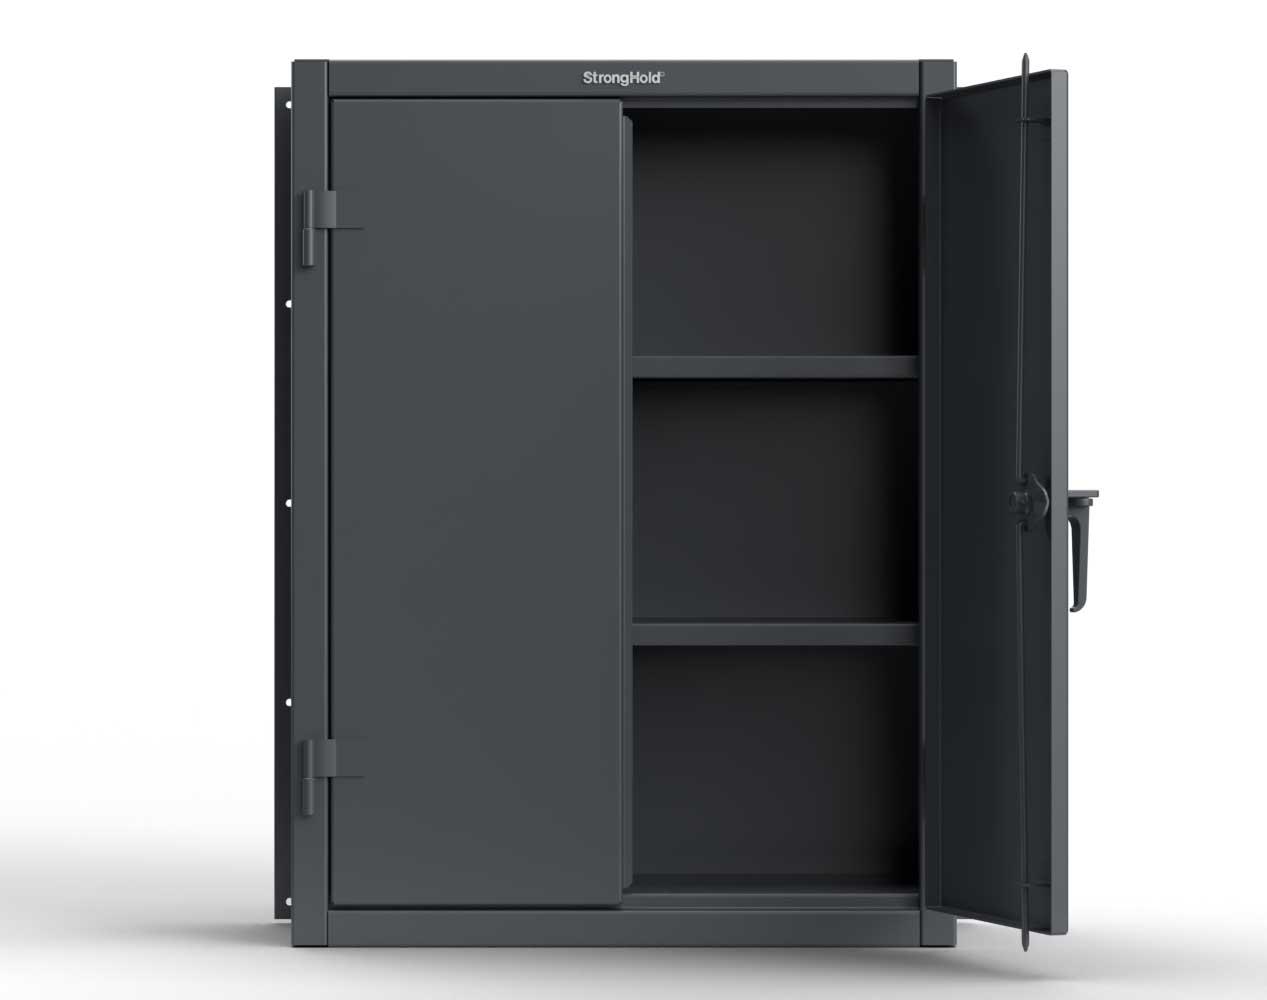 Extra Heavy Duty 12 GA Wall Mounted Cabinet, 2 Shelves – 36 In. W x 14 In. D x 48 In. H